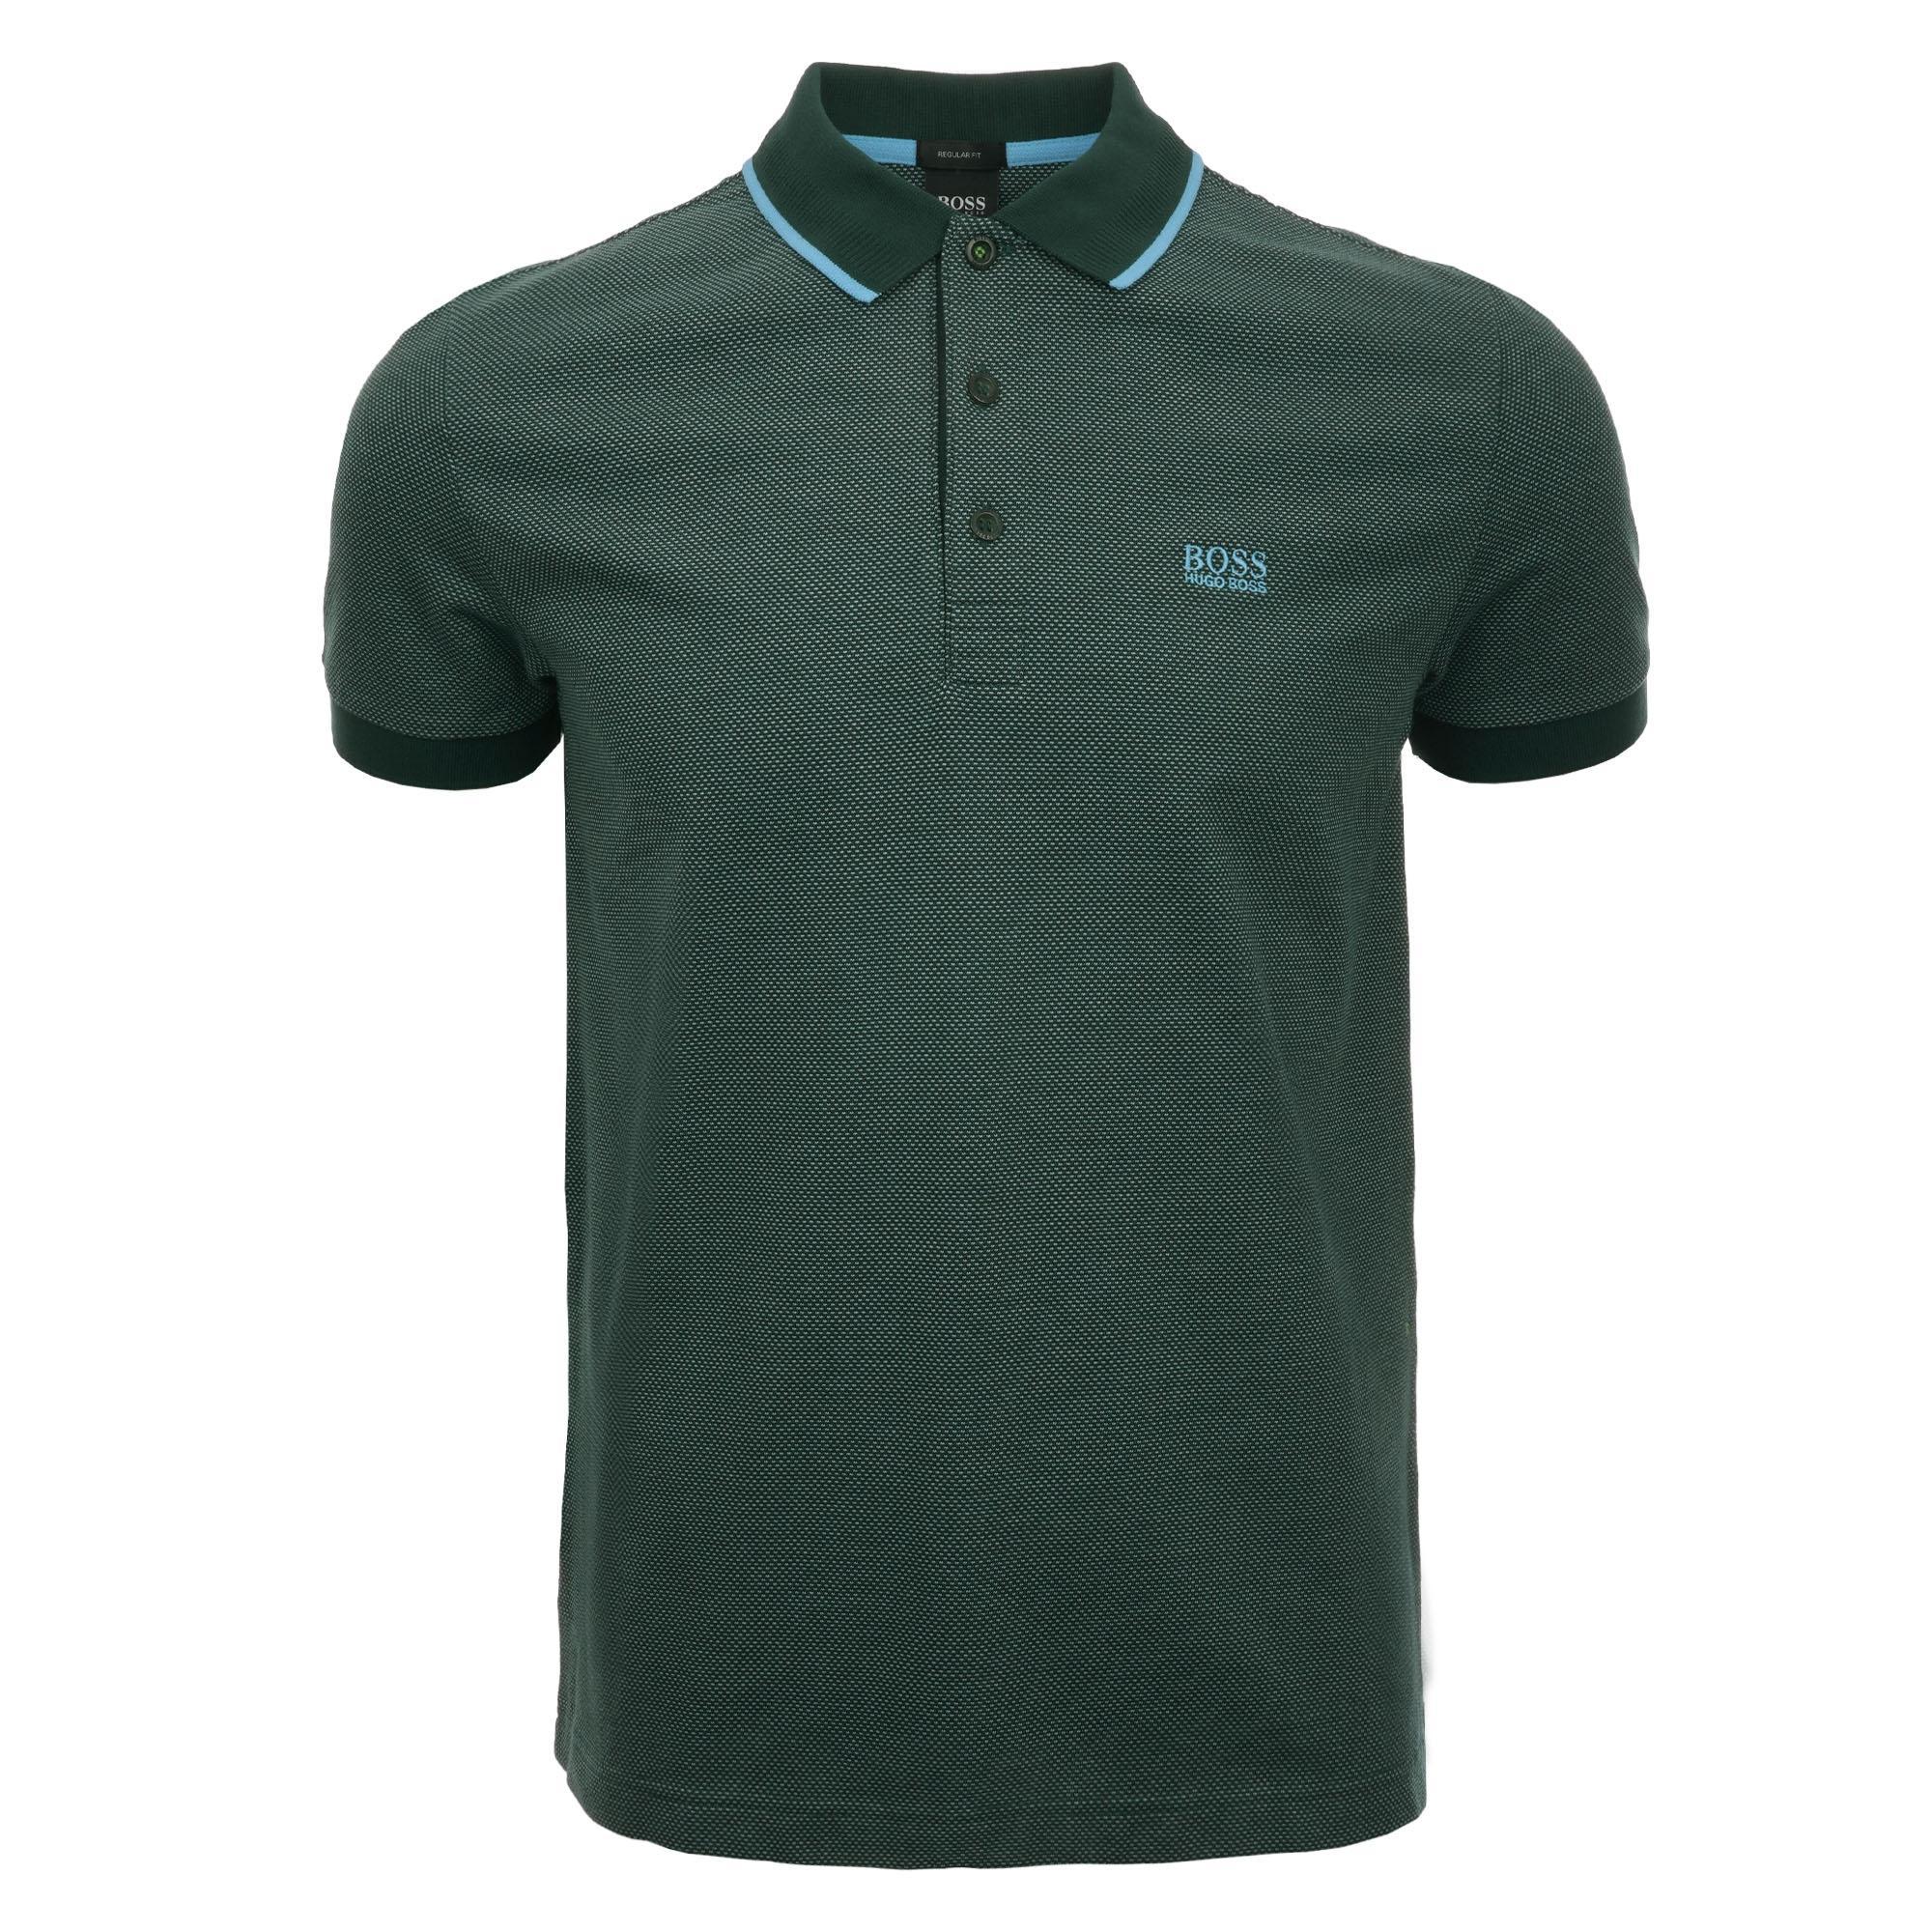 a5976b0cf Lyst - BOSS Paddy 2 Micro-pattern Polo Shirt - Open Green in Green ...